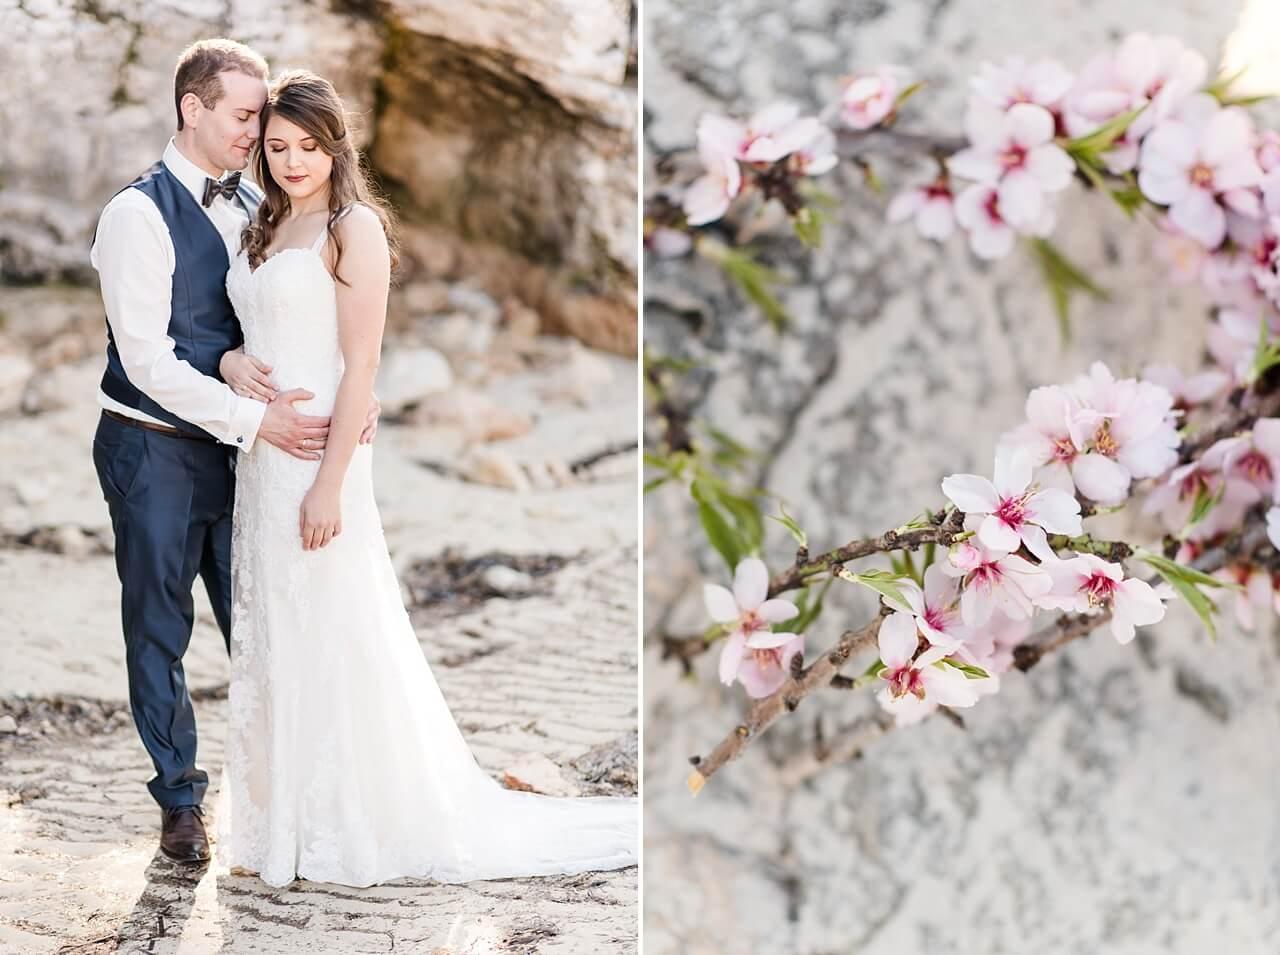 Rebecca Conte Fotografie: After Wedding Shoot Mallorca 37